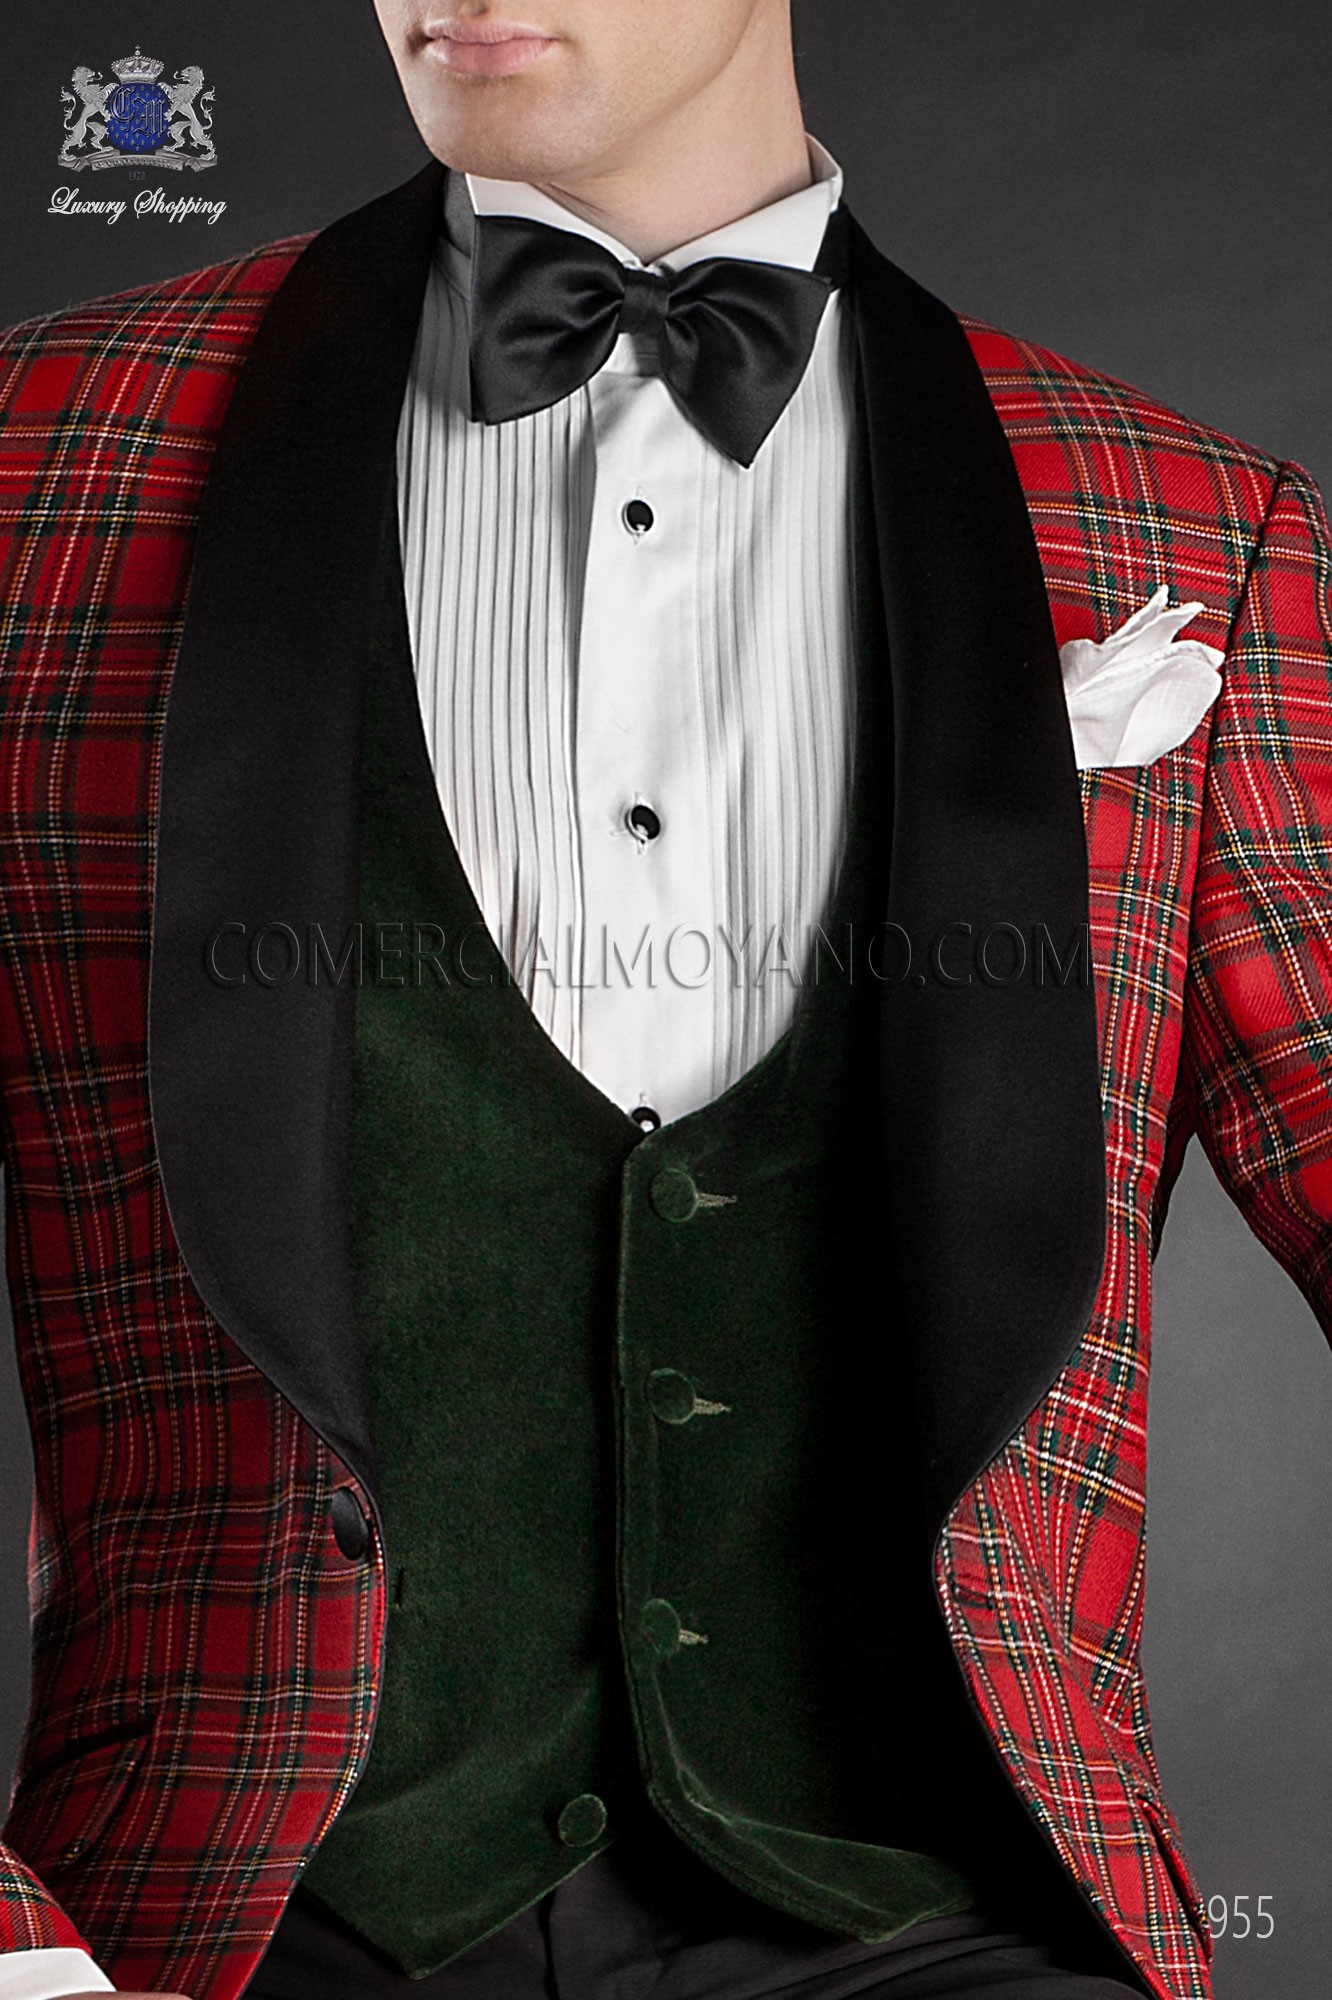 Green and black waistcoat